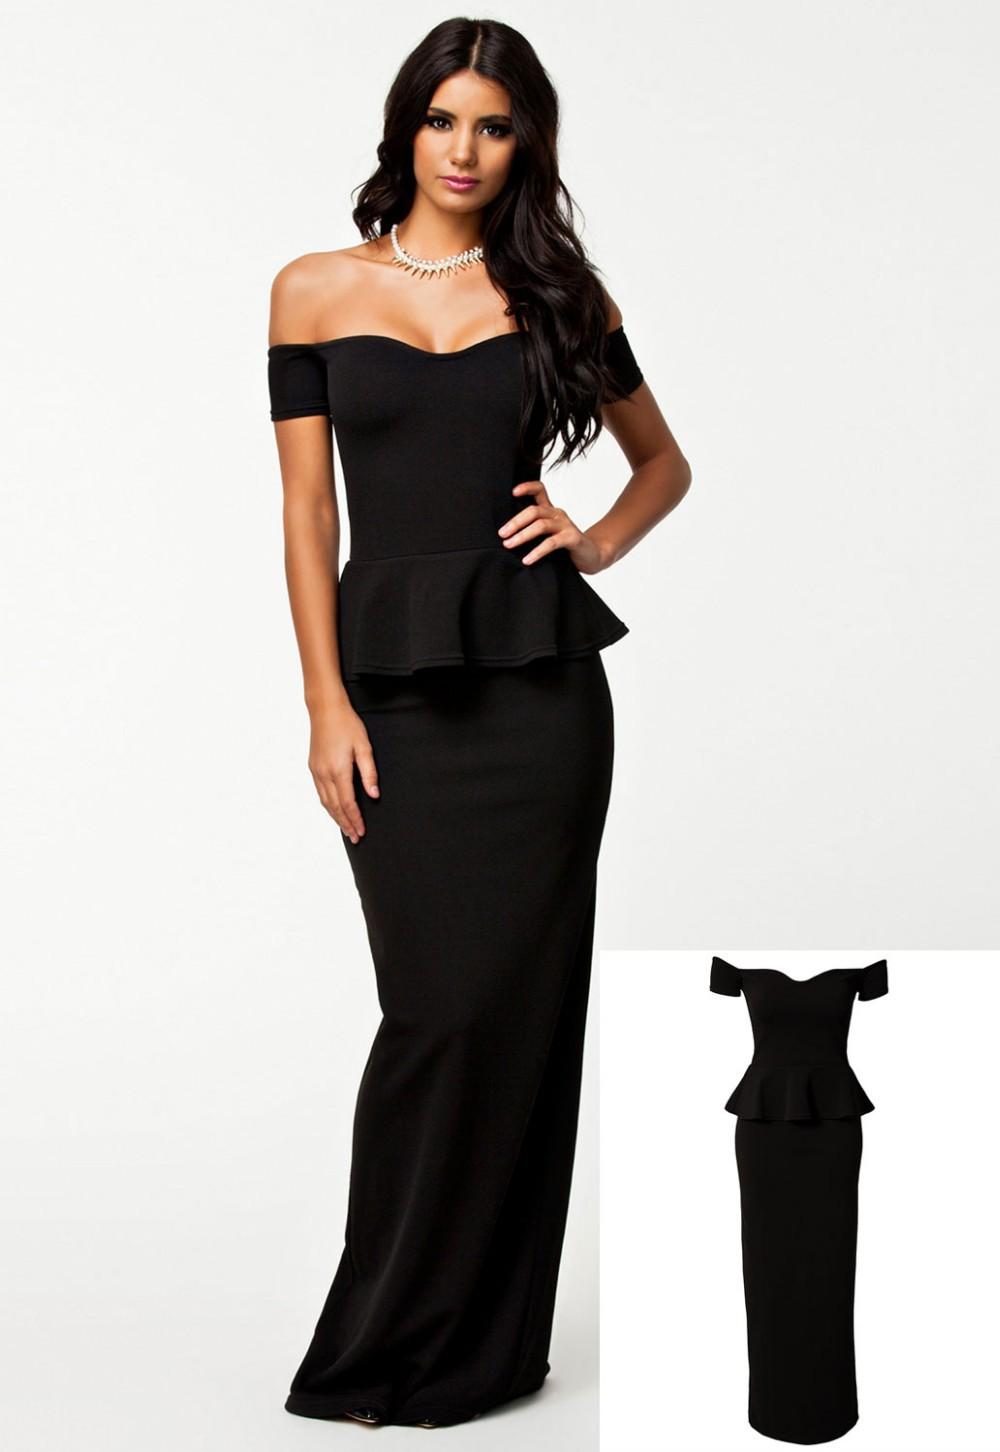 Black-Peplum-Maxi-Dress-With-Drop-shoulder-LC6244-13108